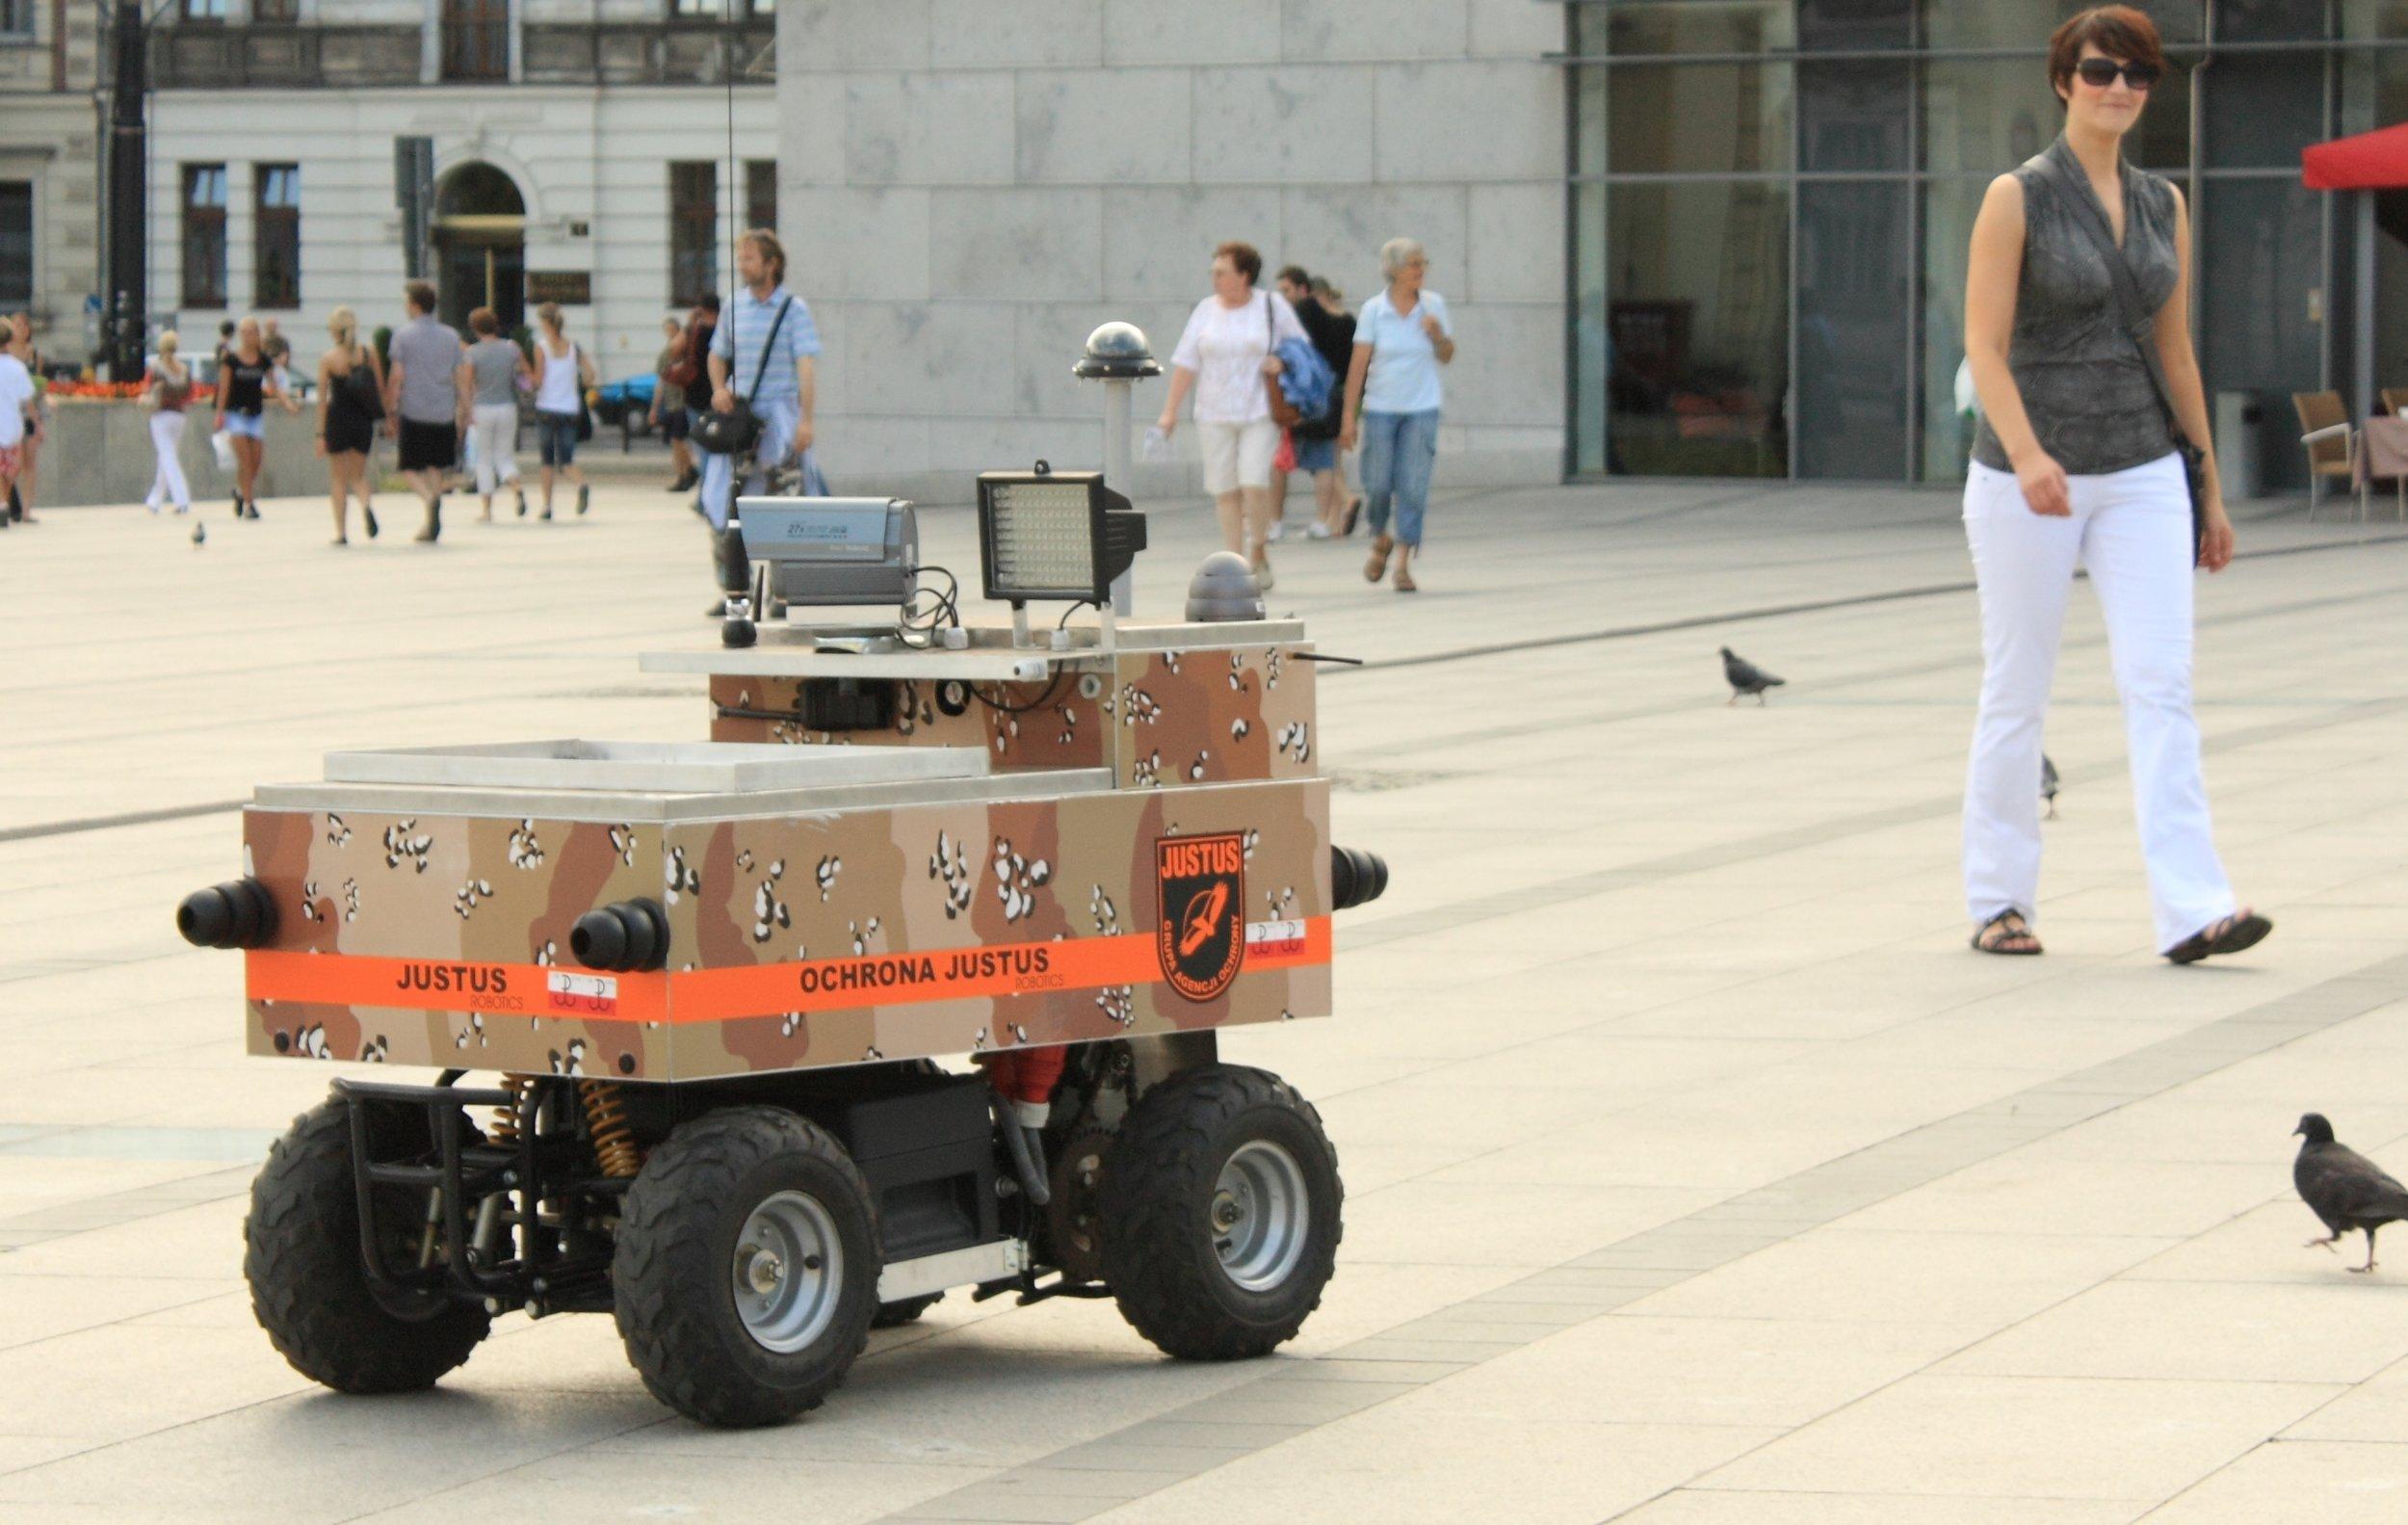 ' Justus robot in Krakow Poland ', by Matti Paavola ( CC BY-SA 3.0 ), via Wikimedia Commons.